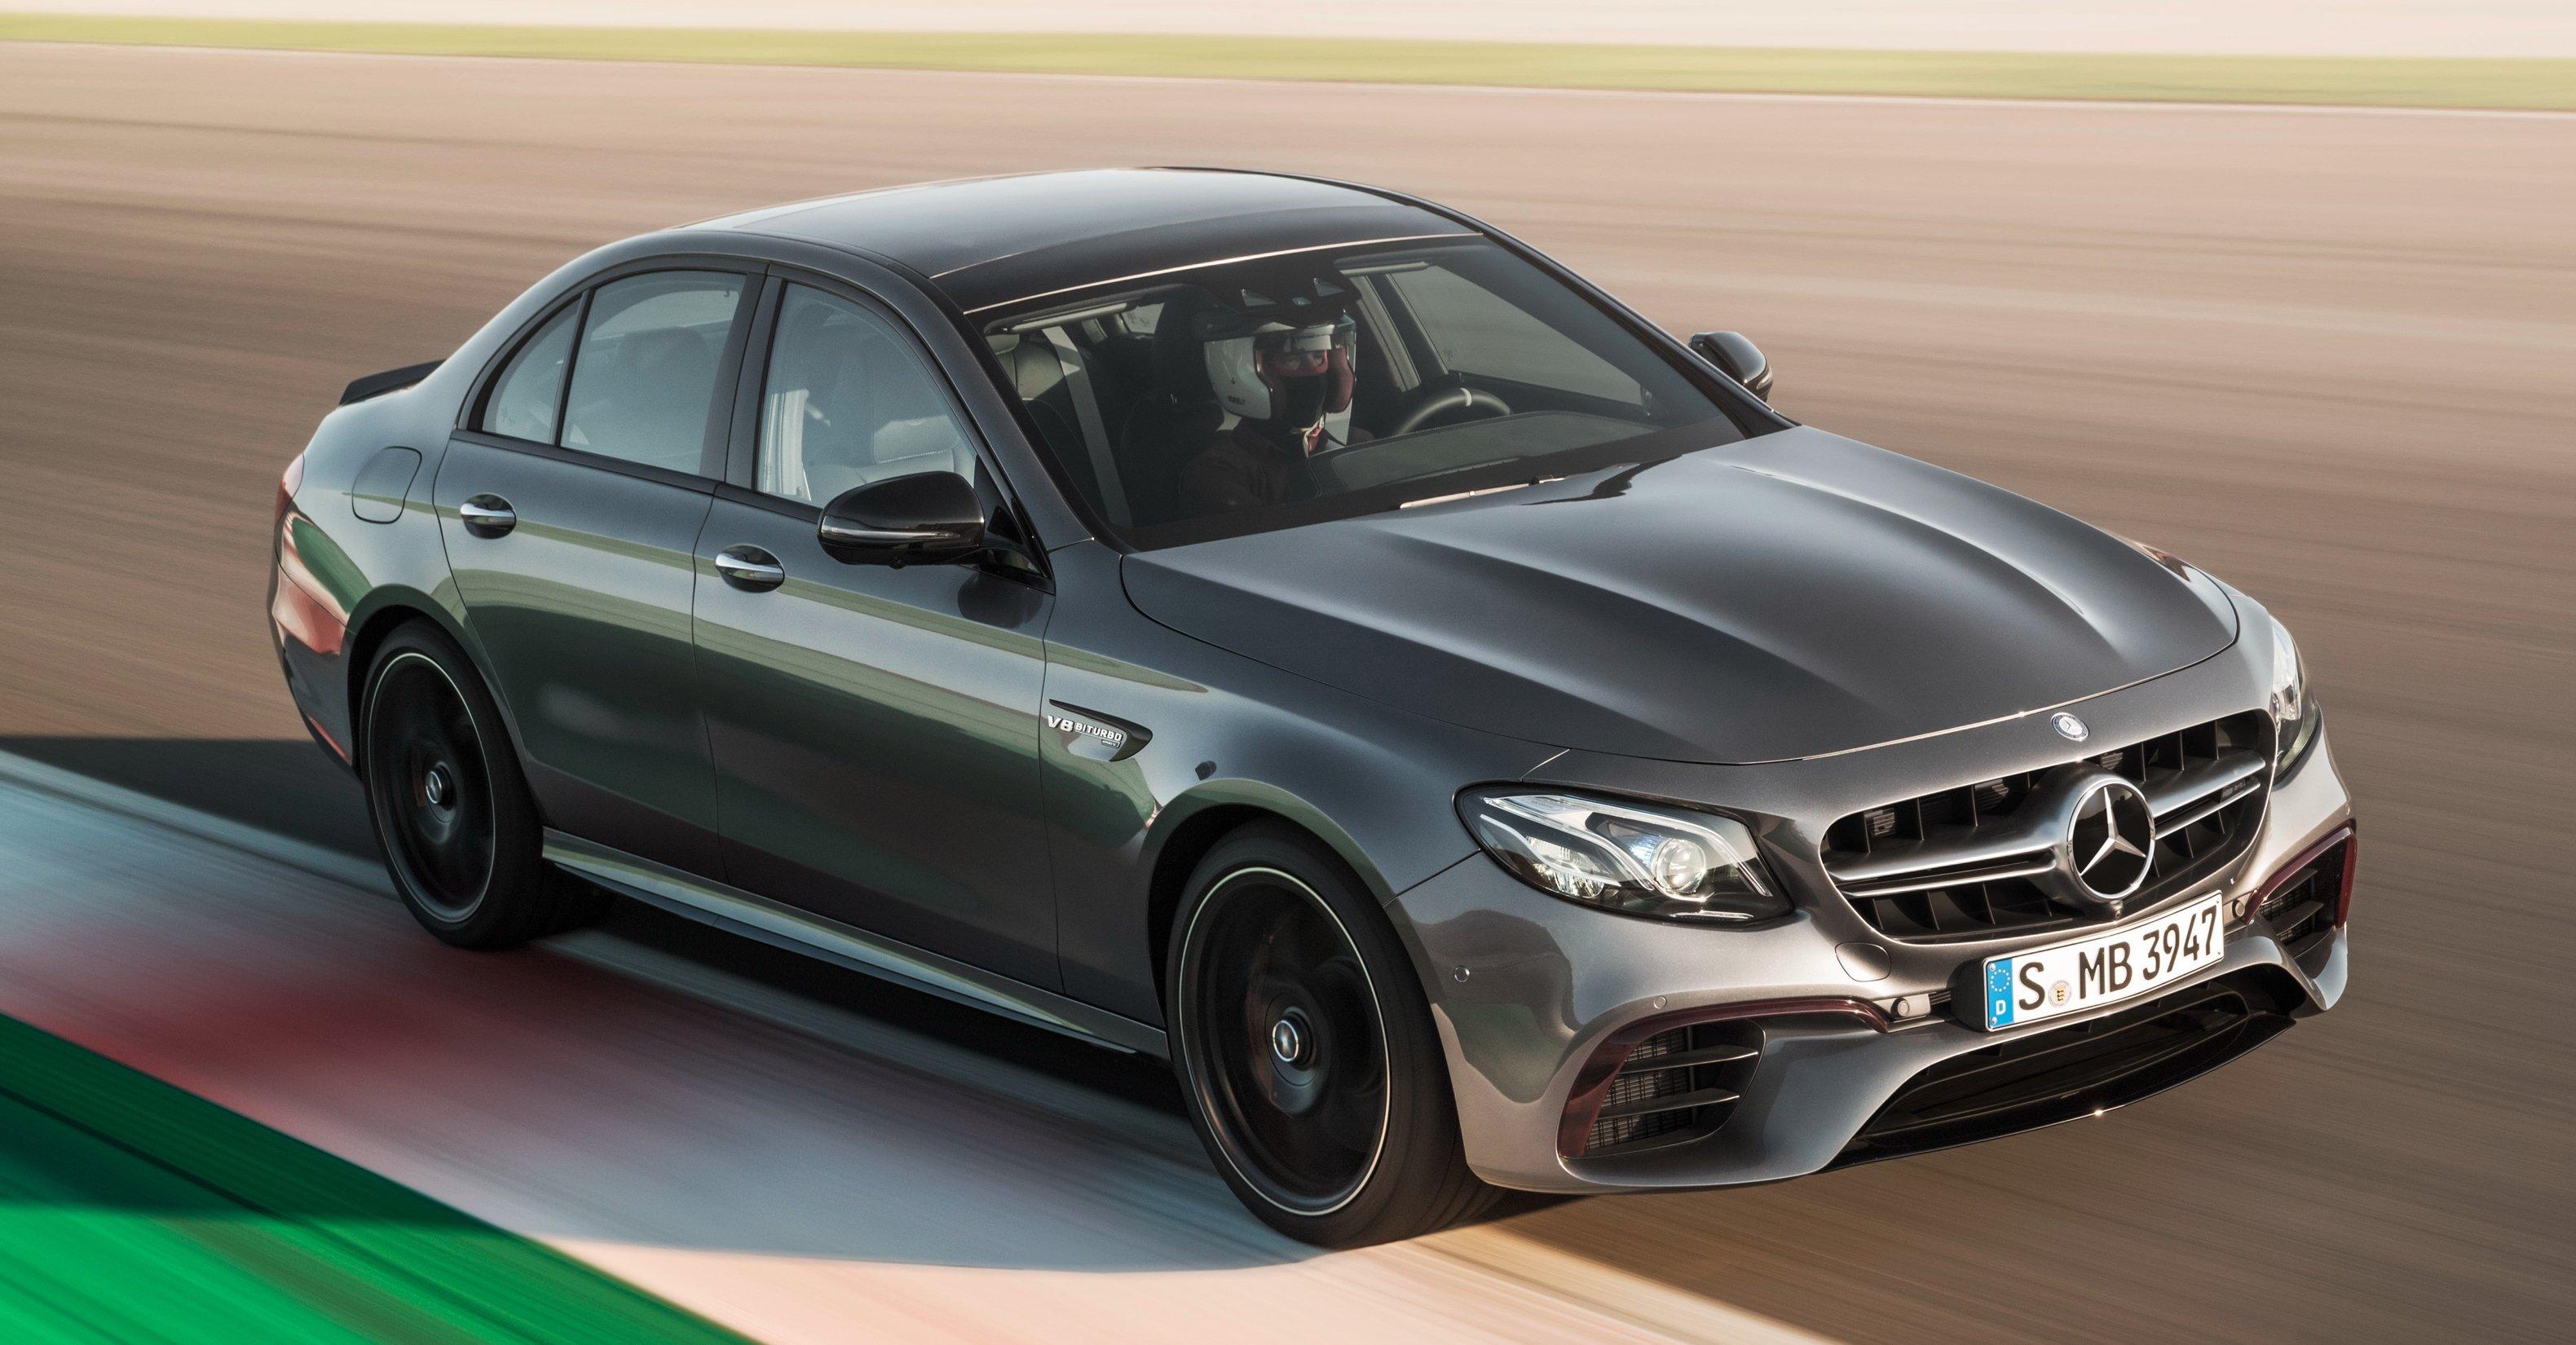 W213 Mercedes Amg E63 4matic And E63 S 4matic Debuts